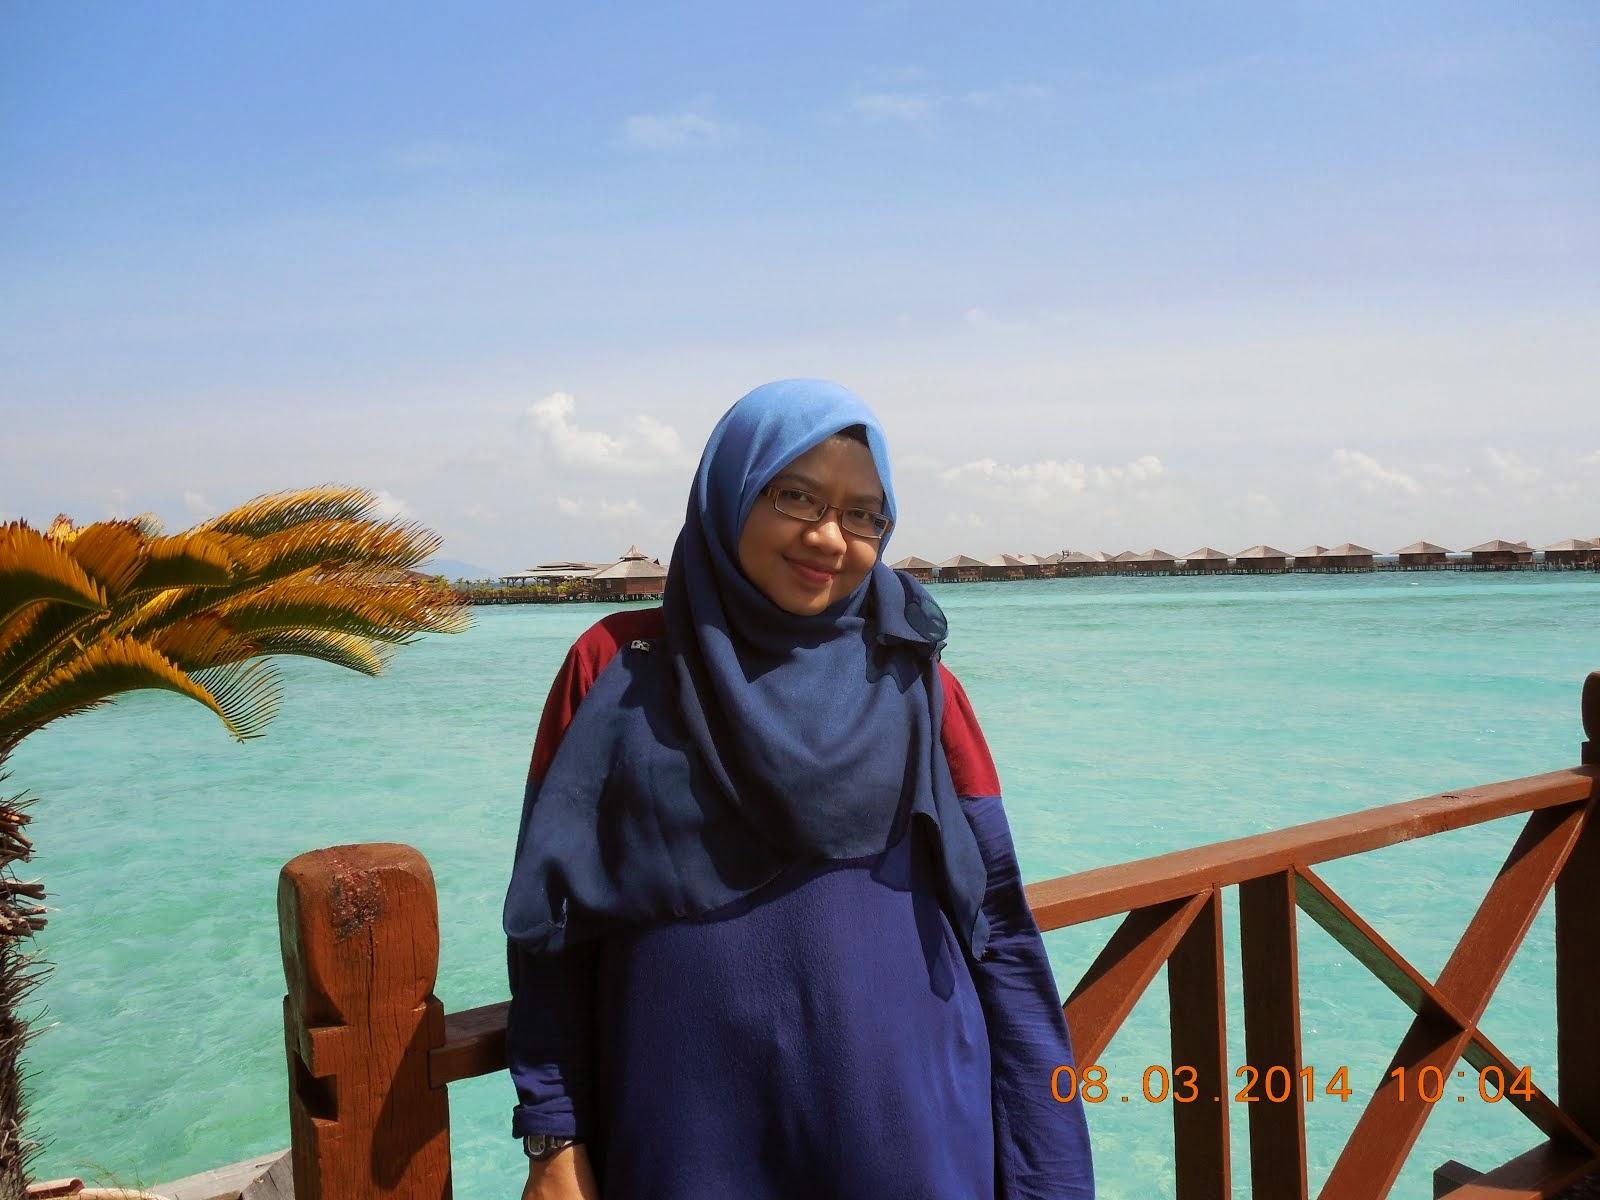 Mabul Island - March 2014